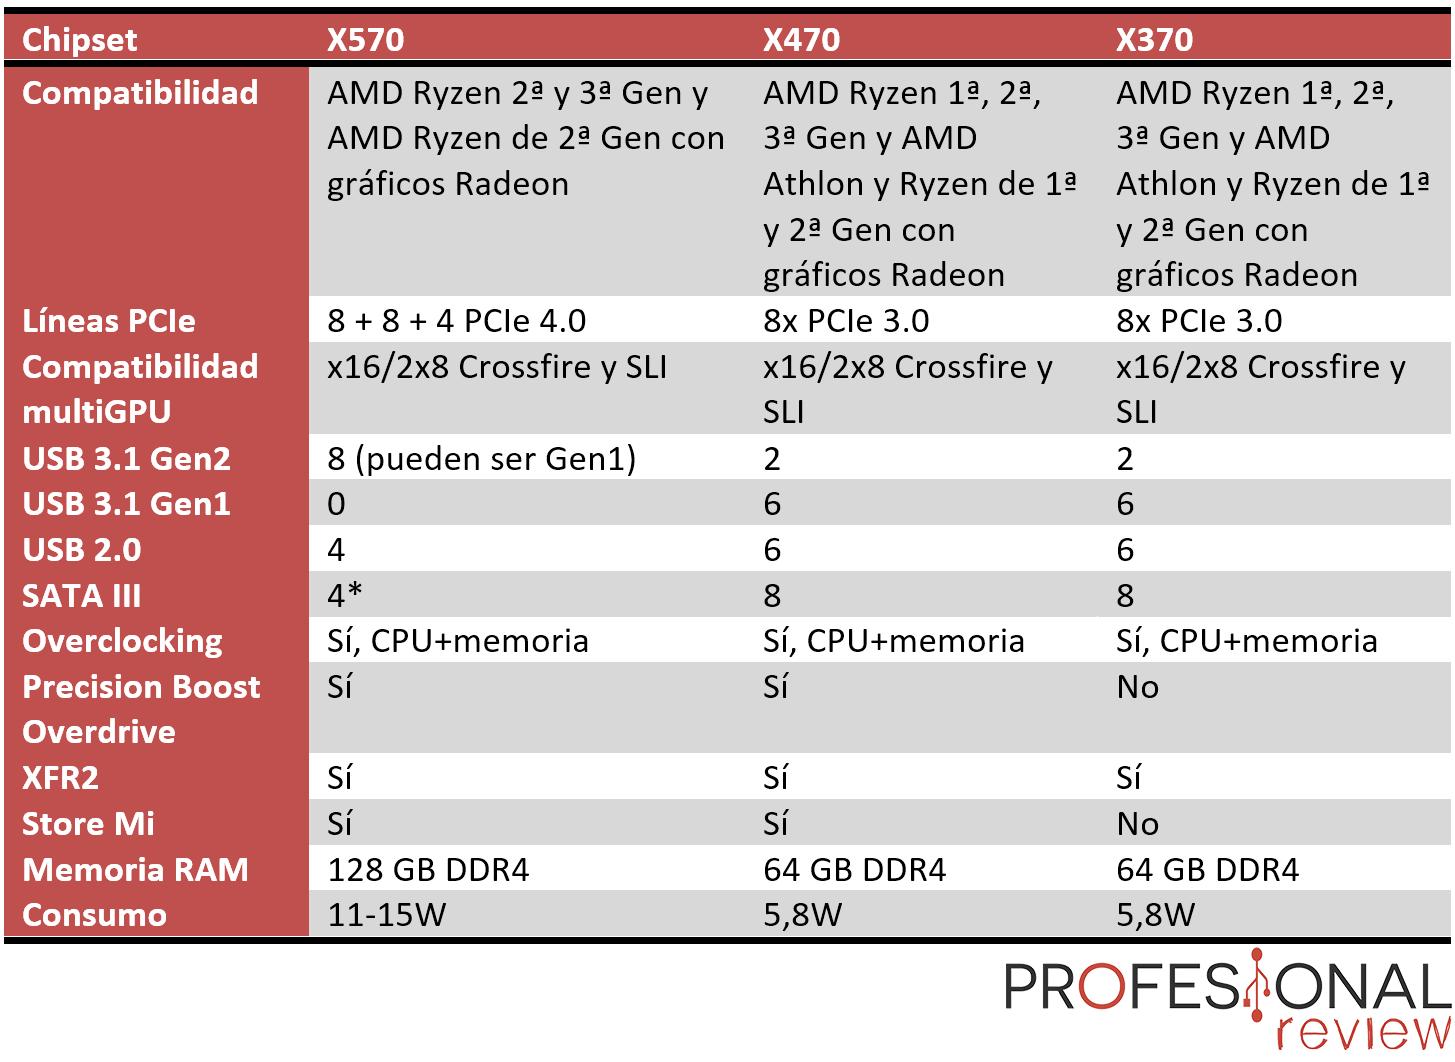 AMD X570 vs X470 vs X370: diferencias entre los chipsets